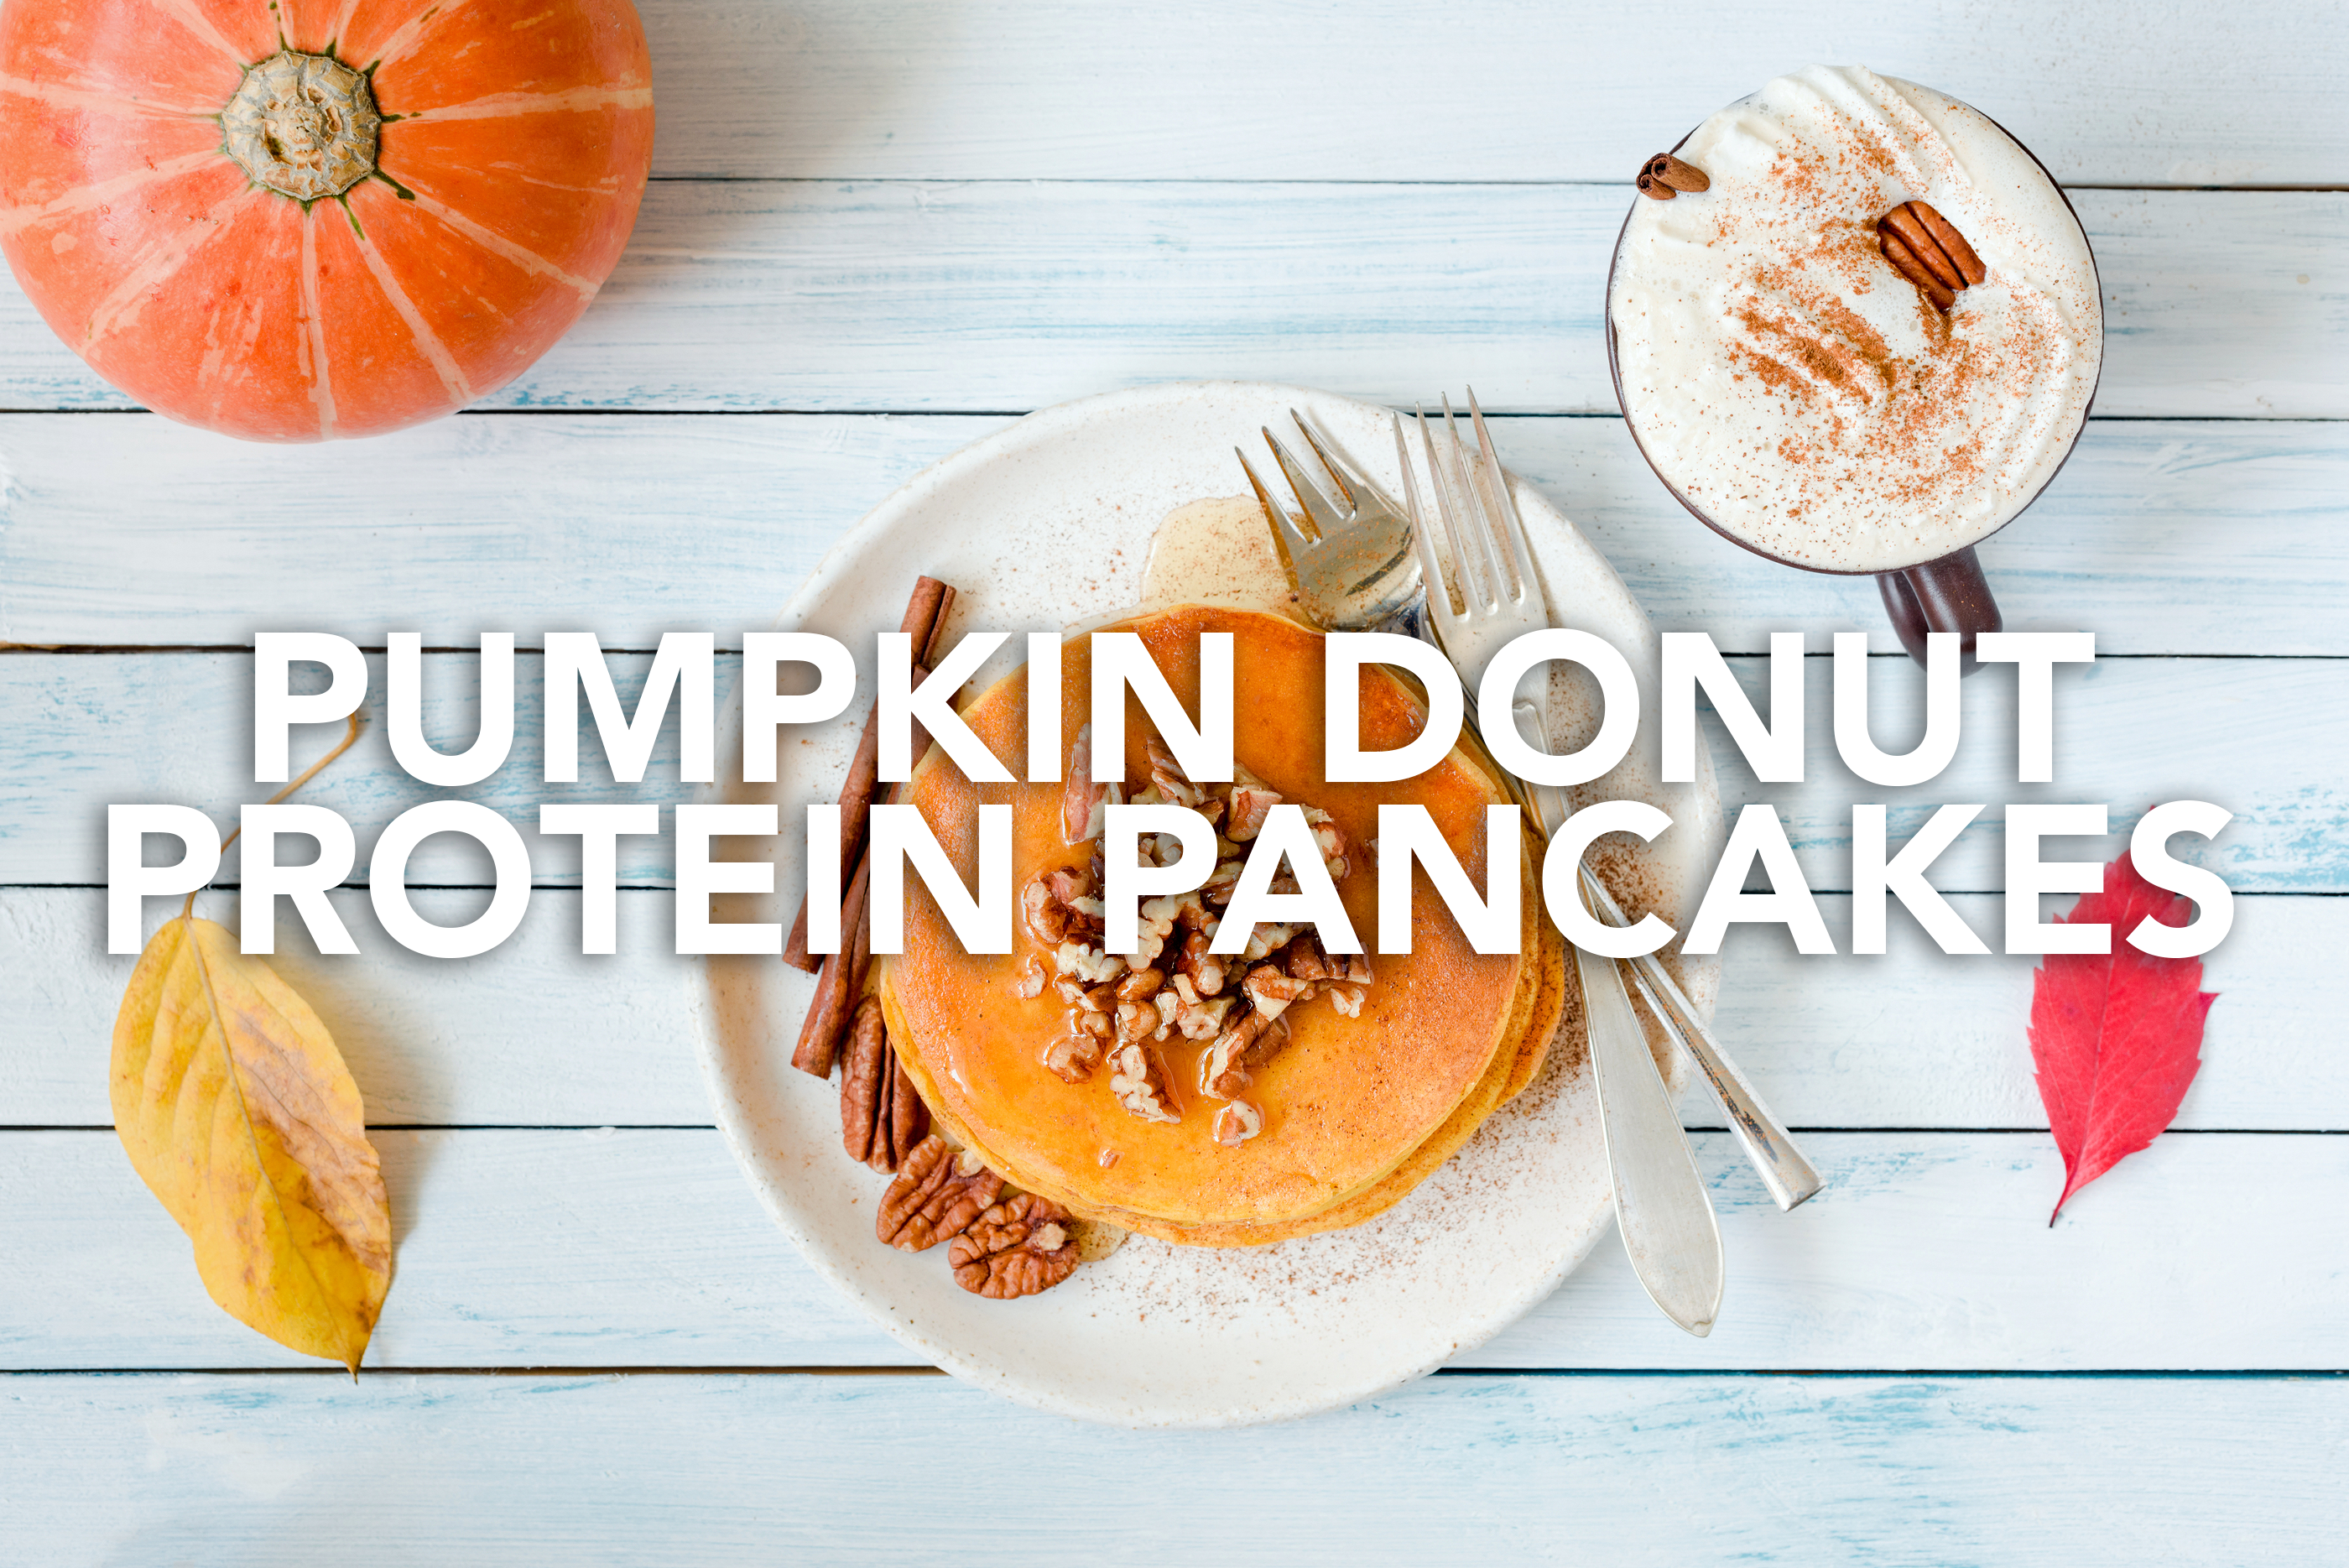 Pumpkin Donut Protein Pancakes